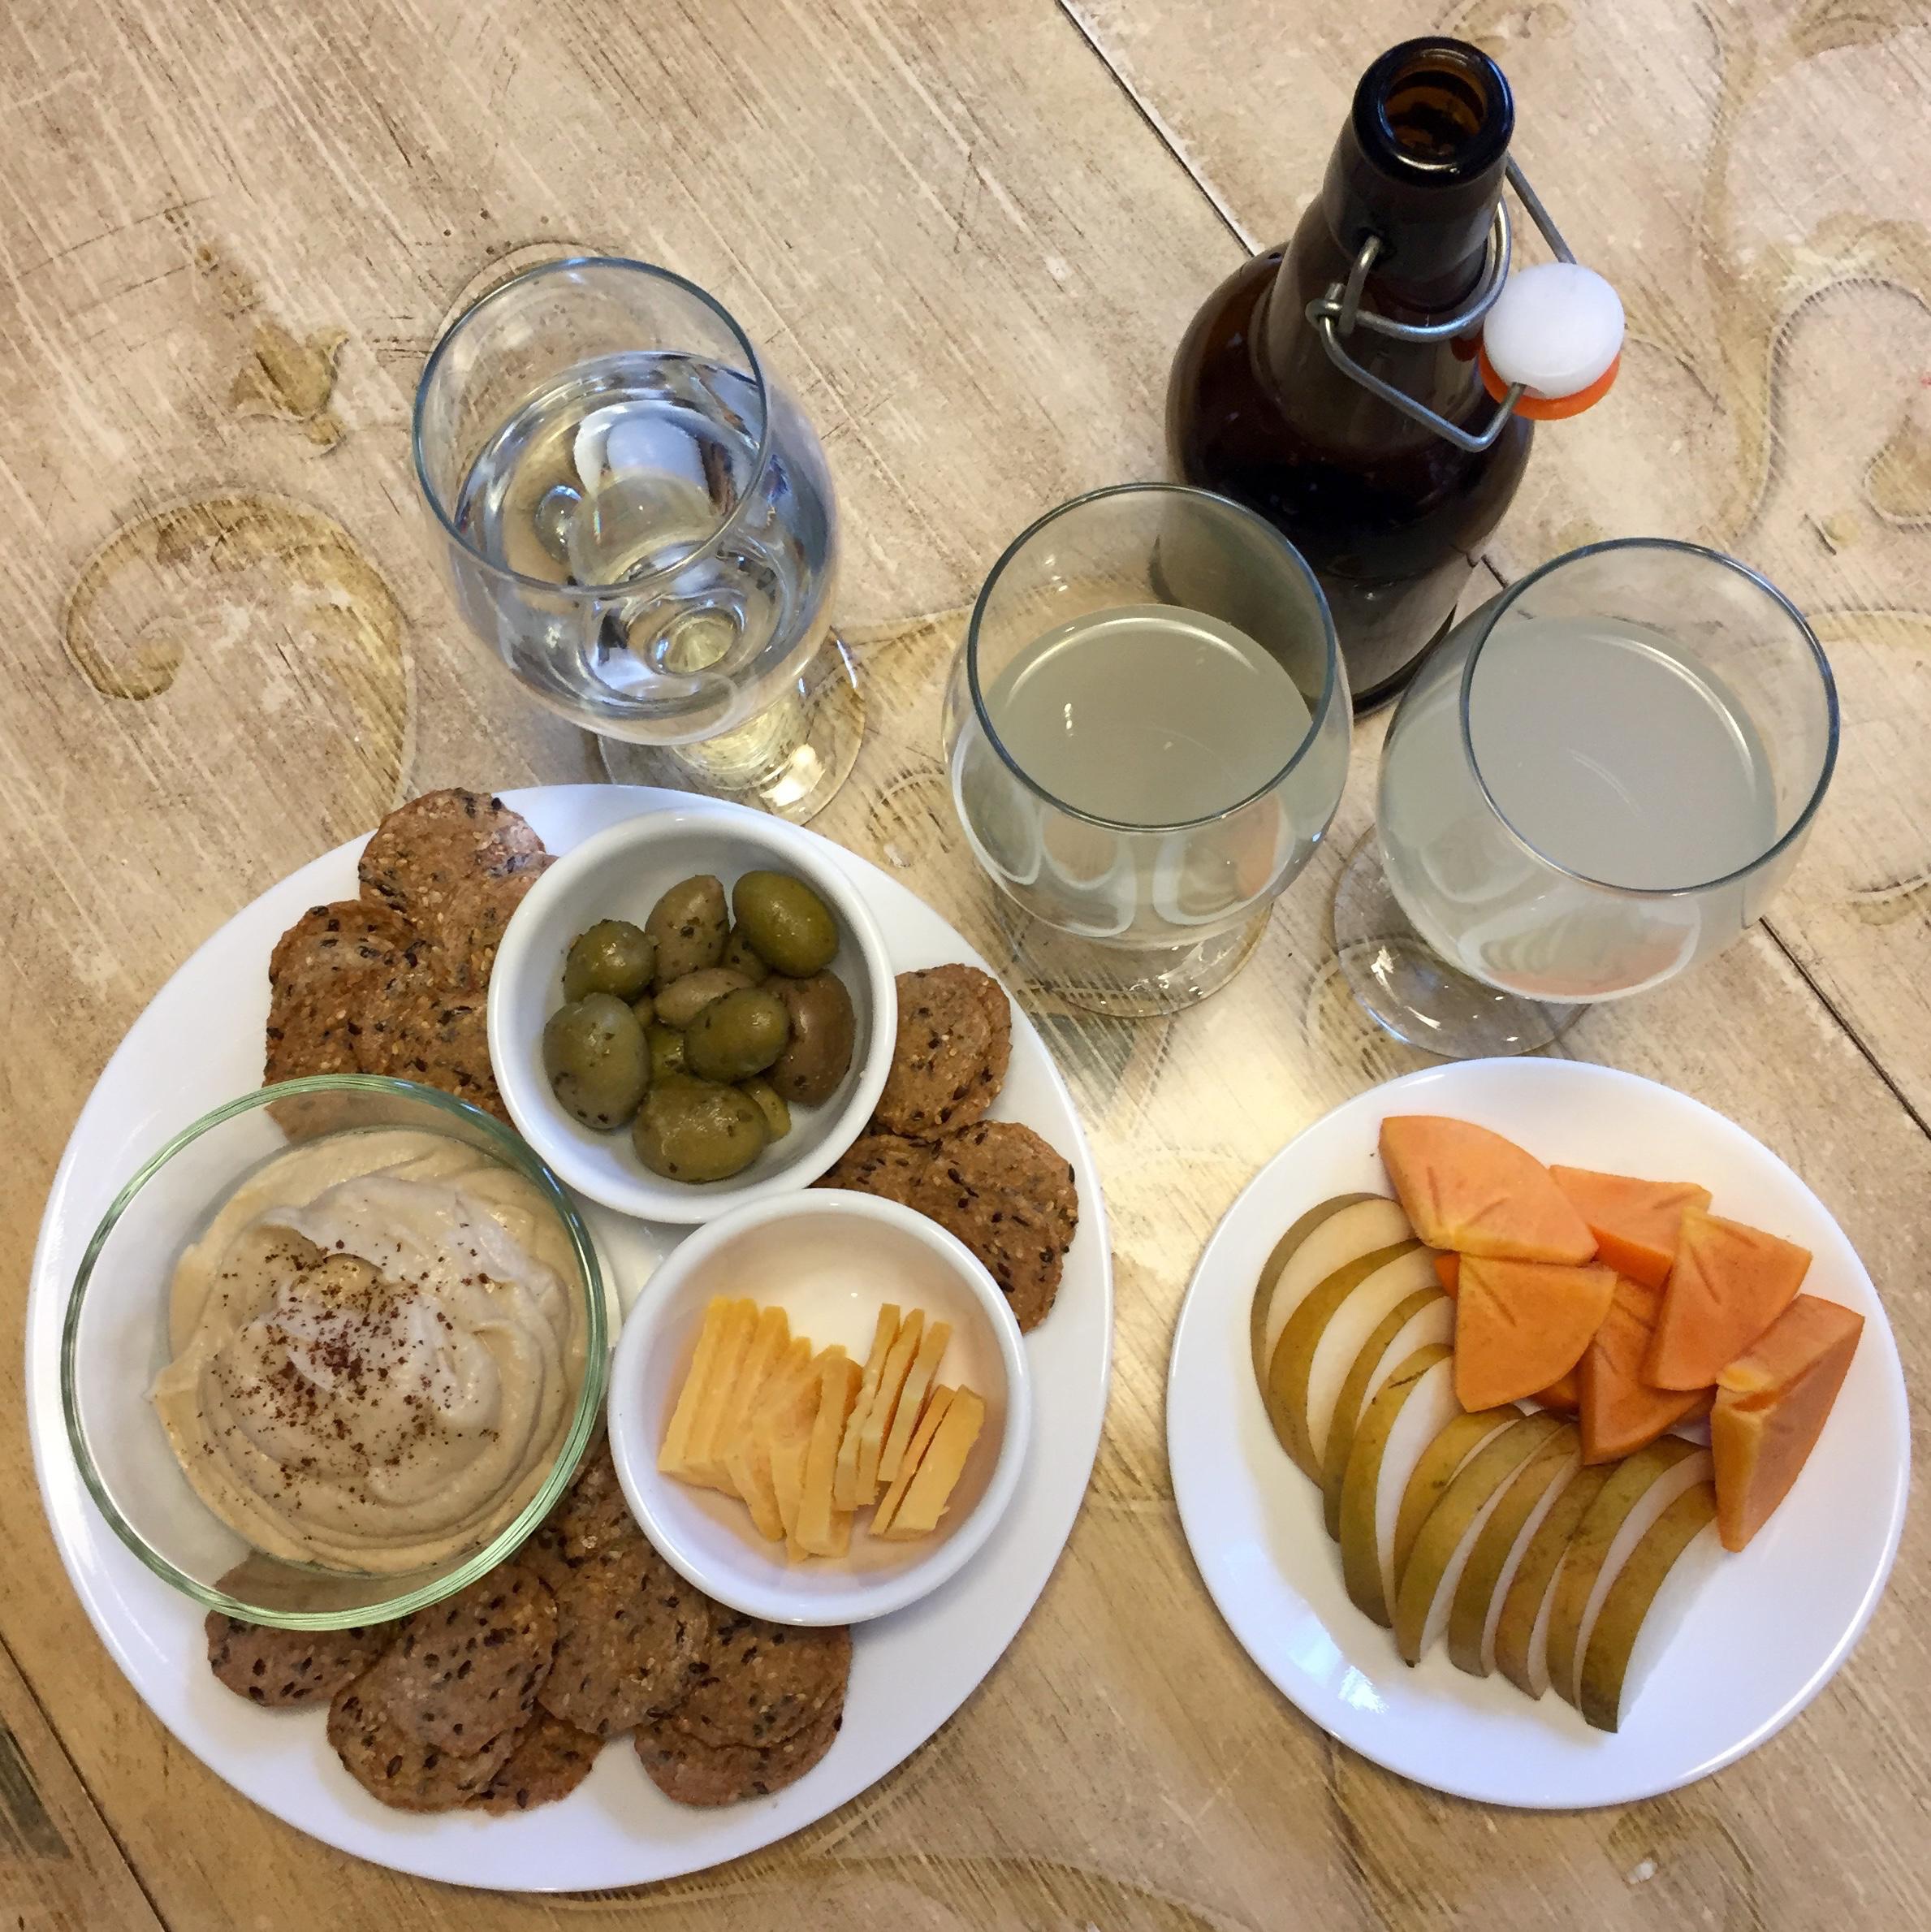 hummus, gouda, olives, crackers, asian pear, persimmon